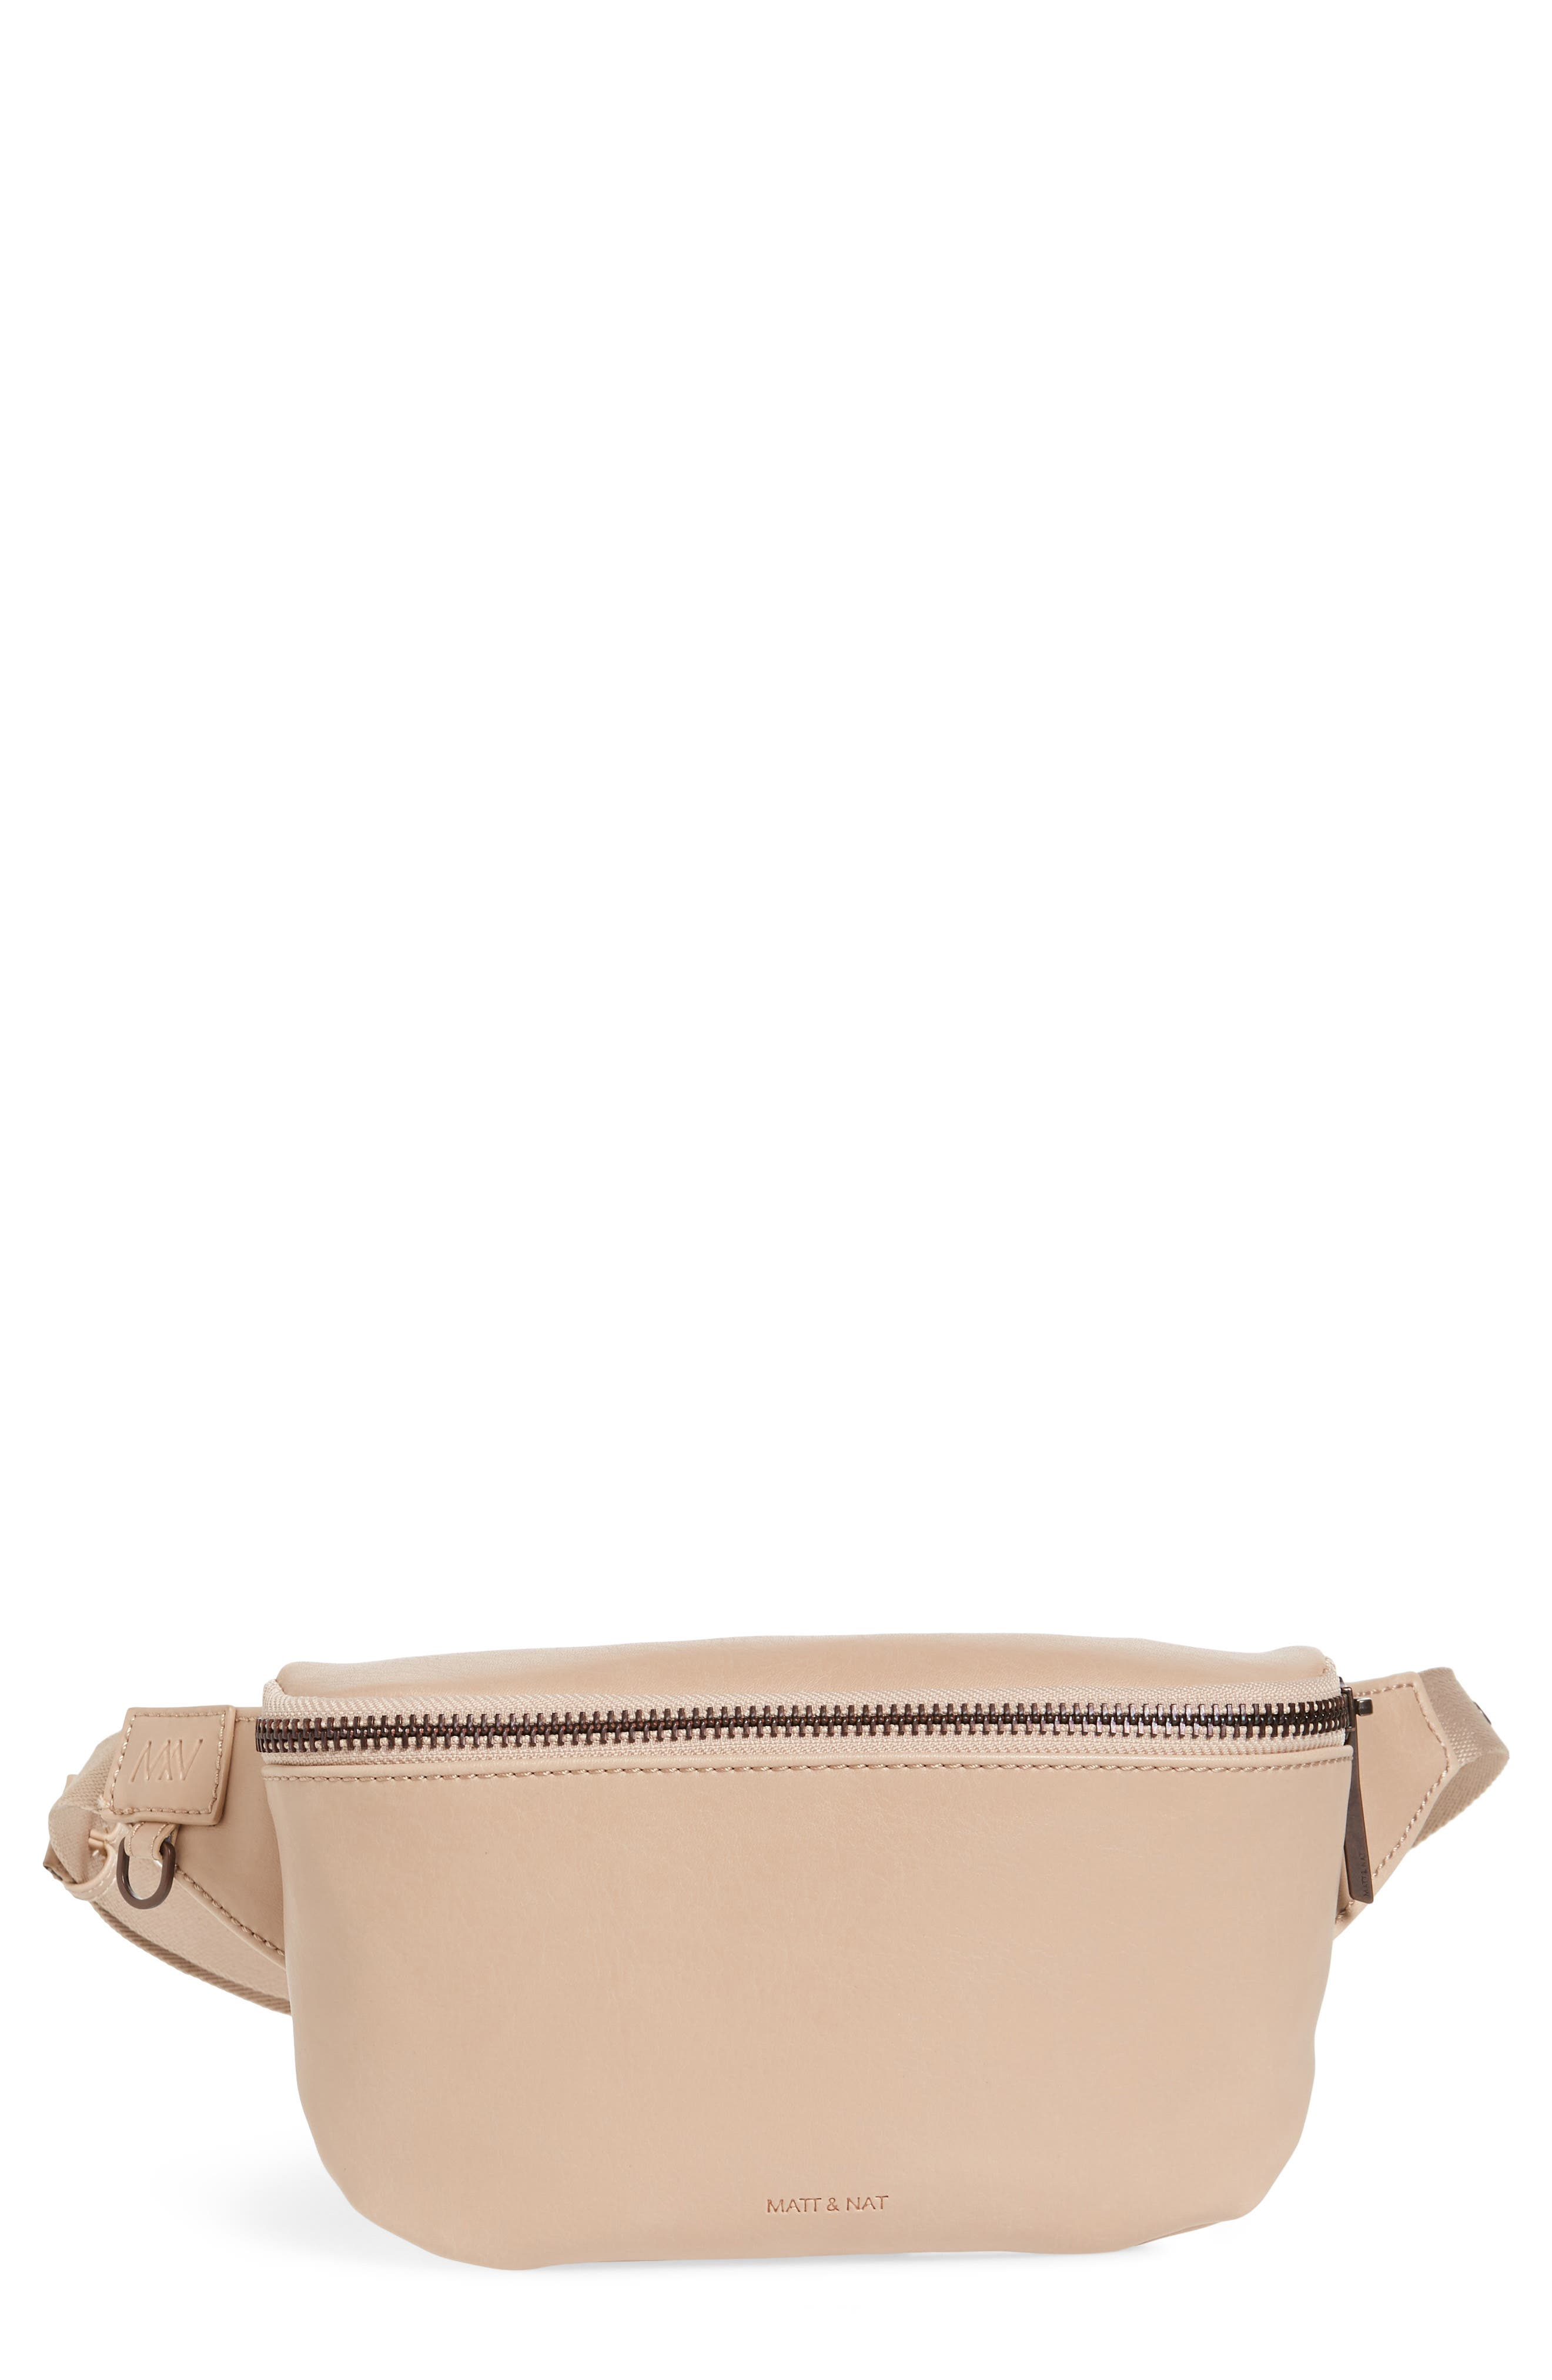 Matt & Nat Vie Faux Leather Belt Bag - Beige